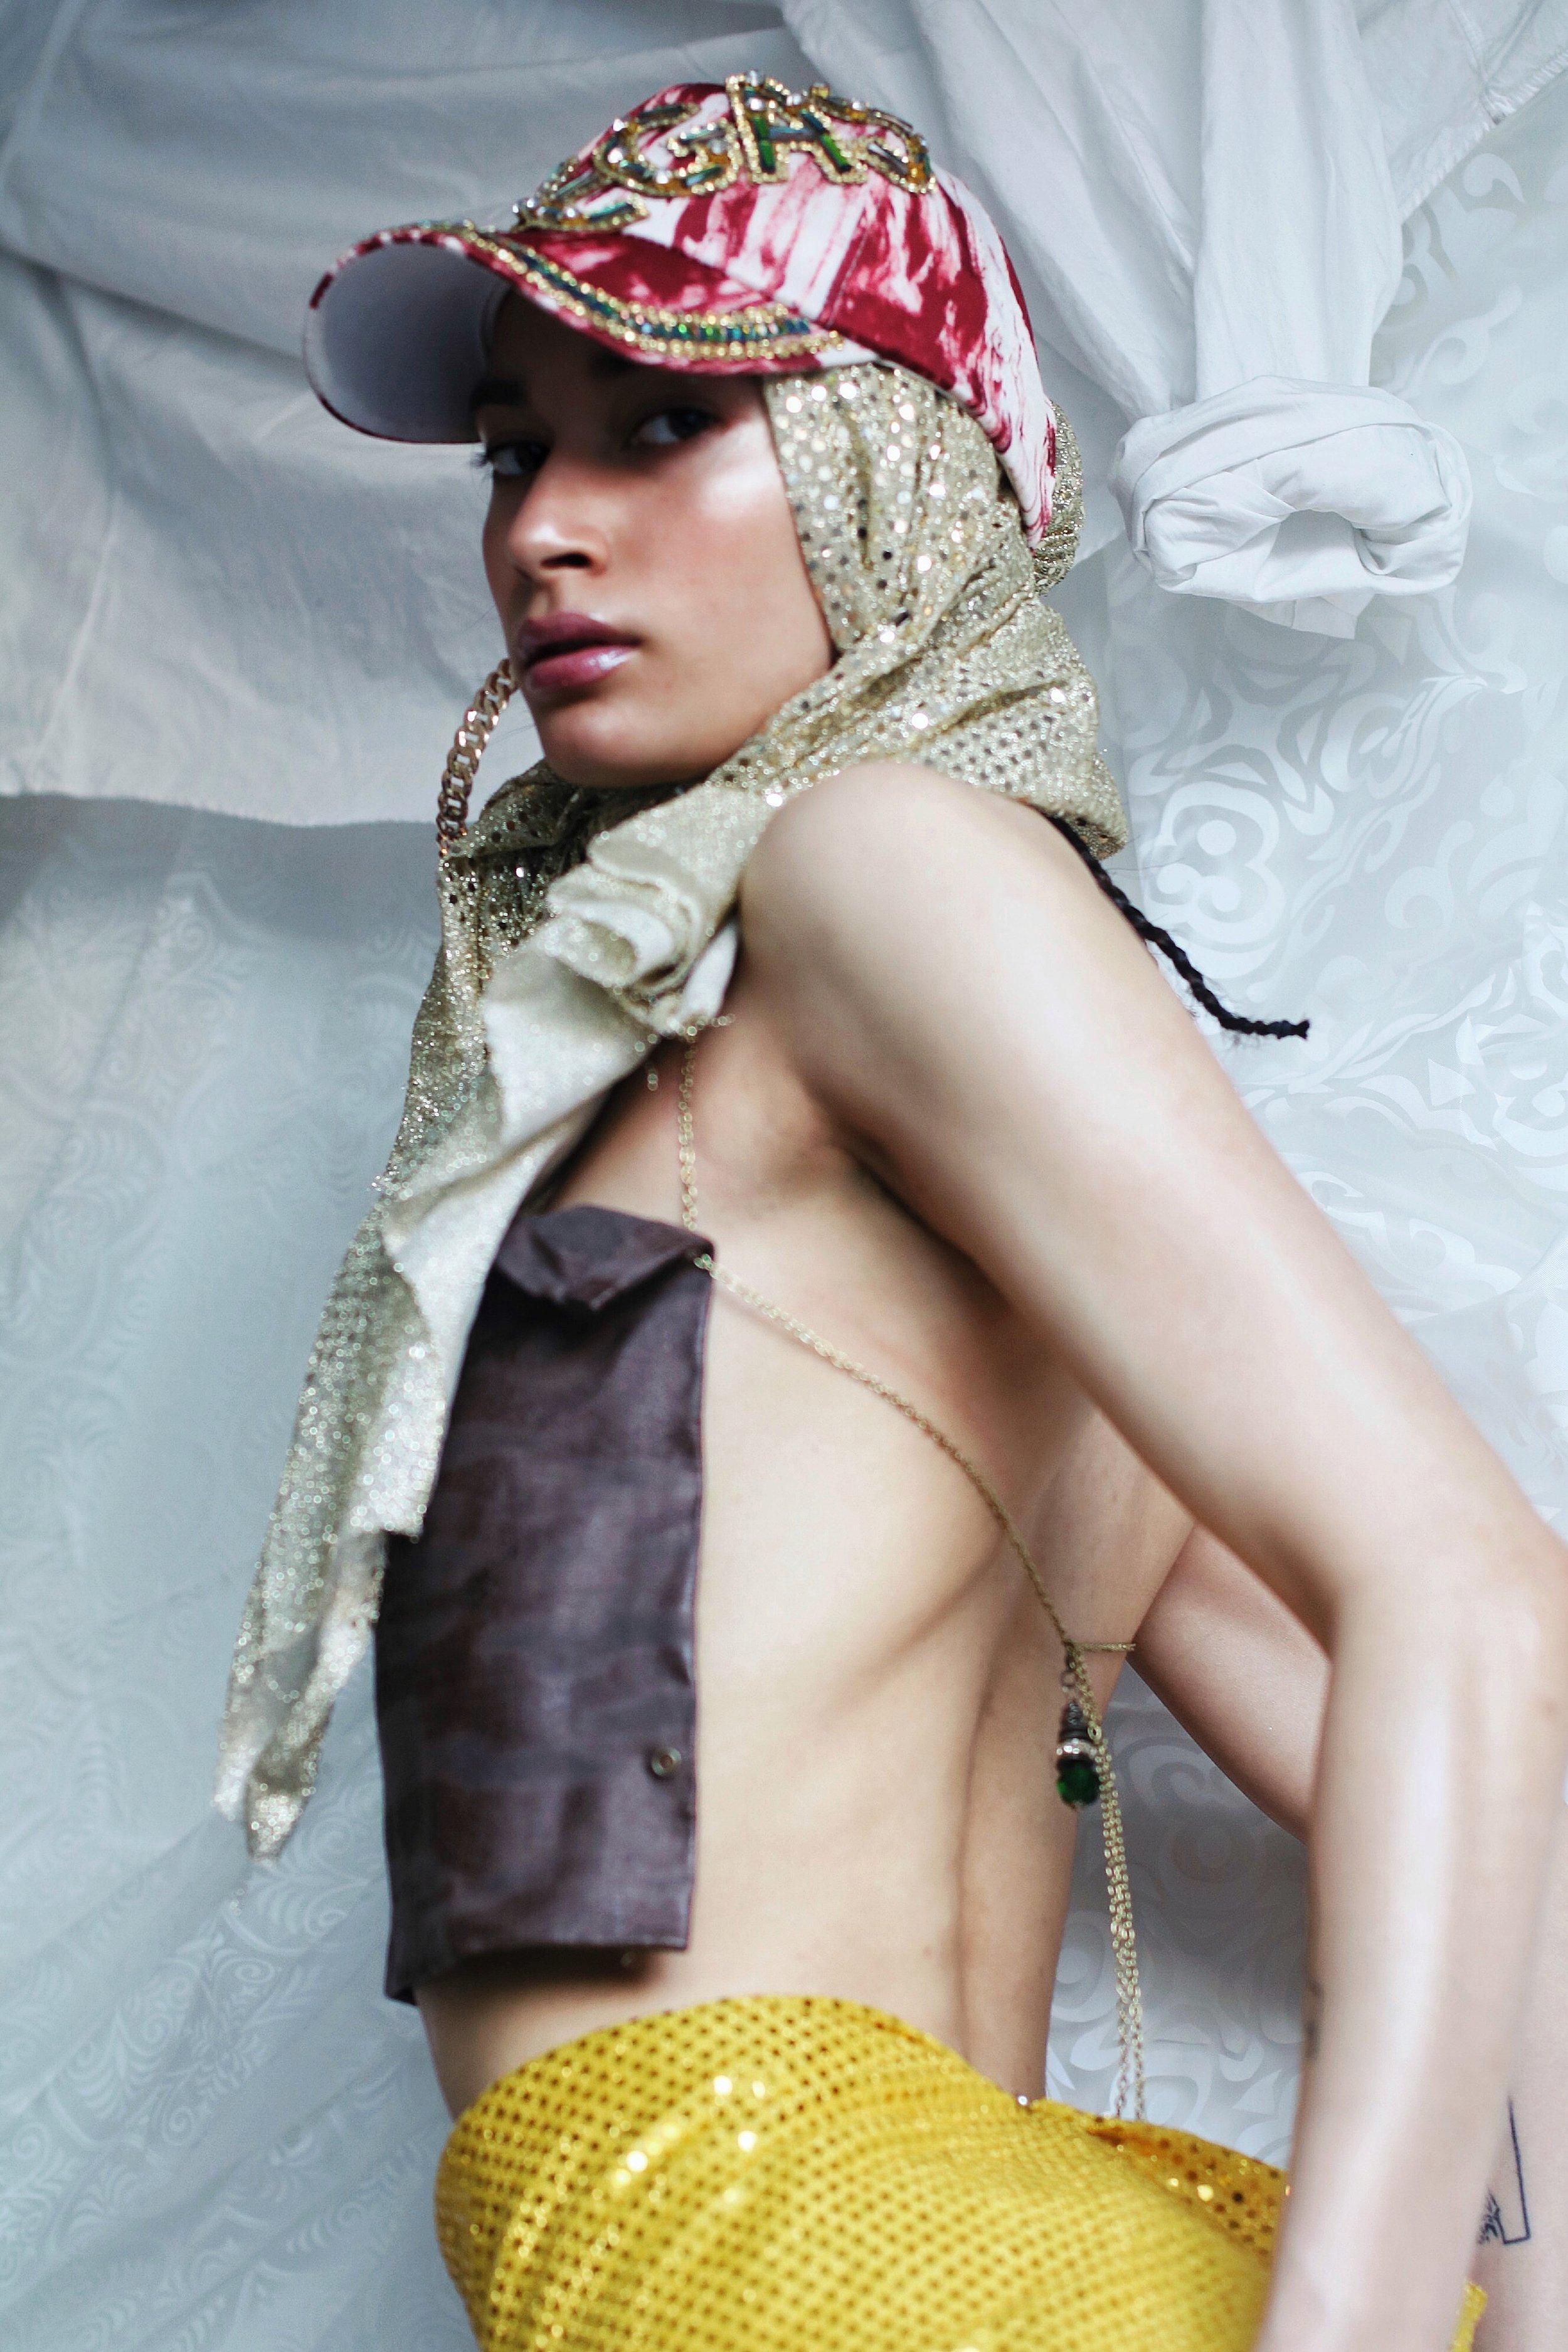 Glasses: Baby Phat.  Scarf: Balenciaga.  Skirt: Discount Universe.  Top: Helmut Lang.